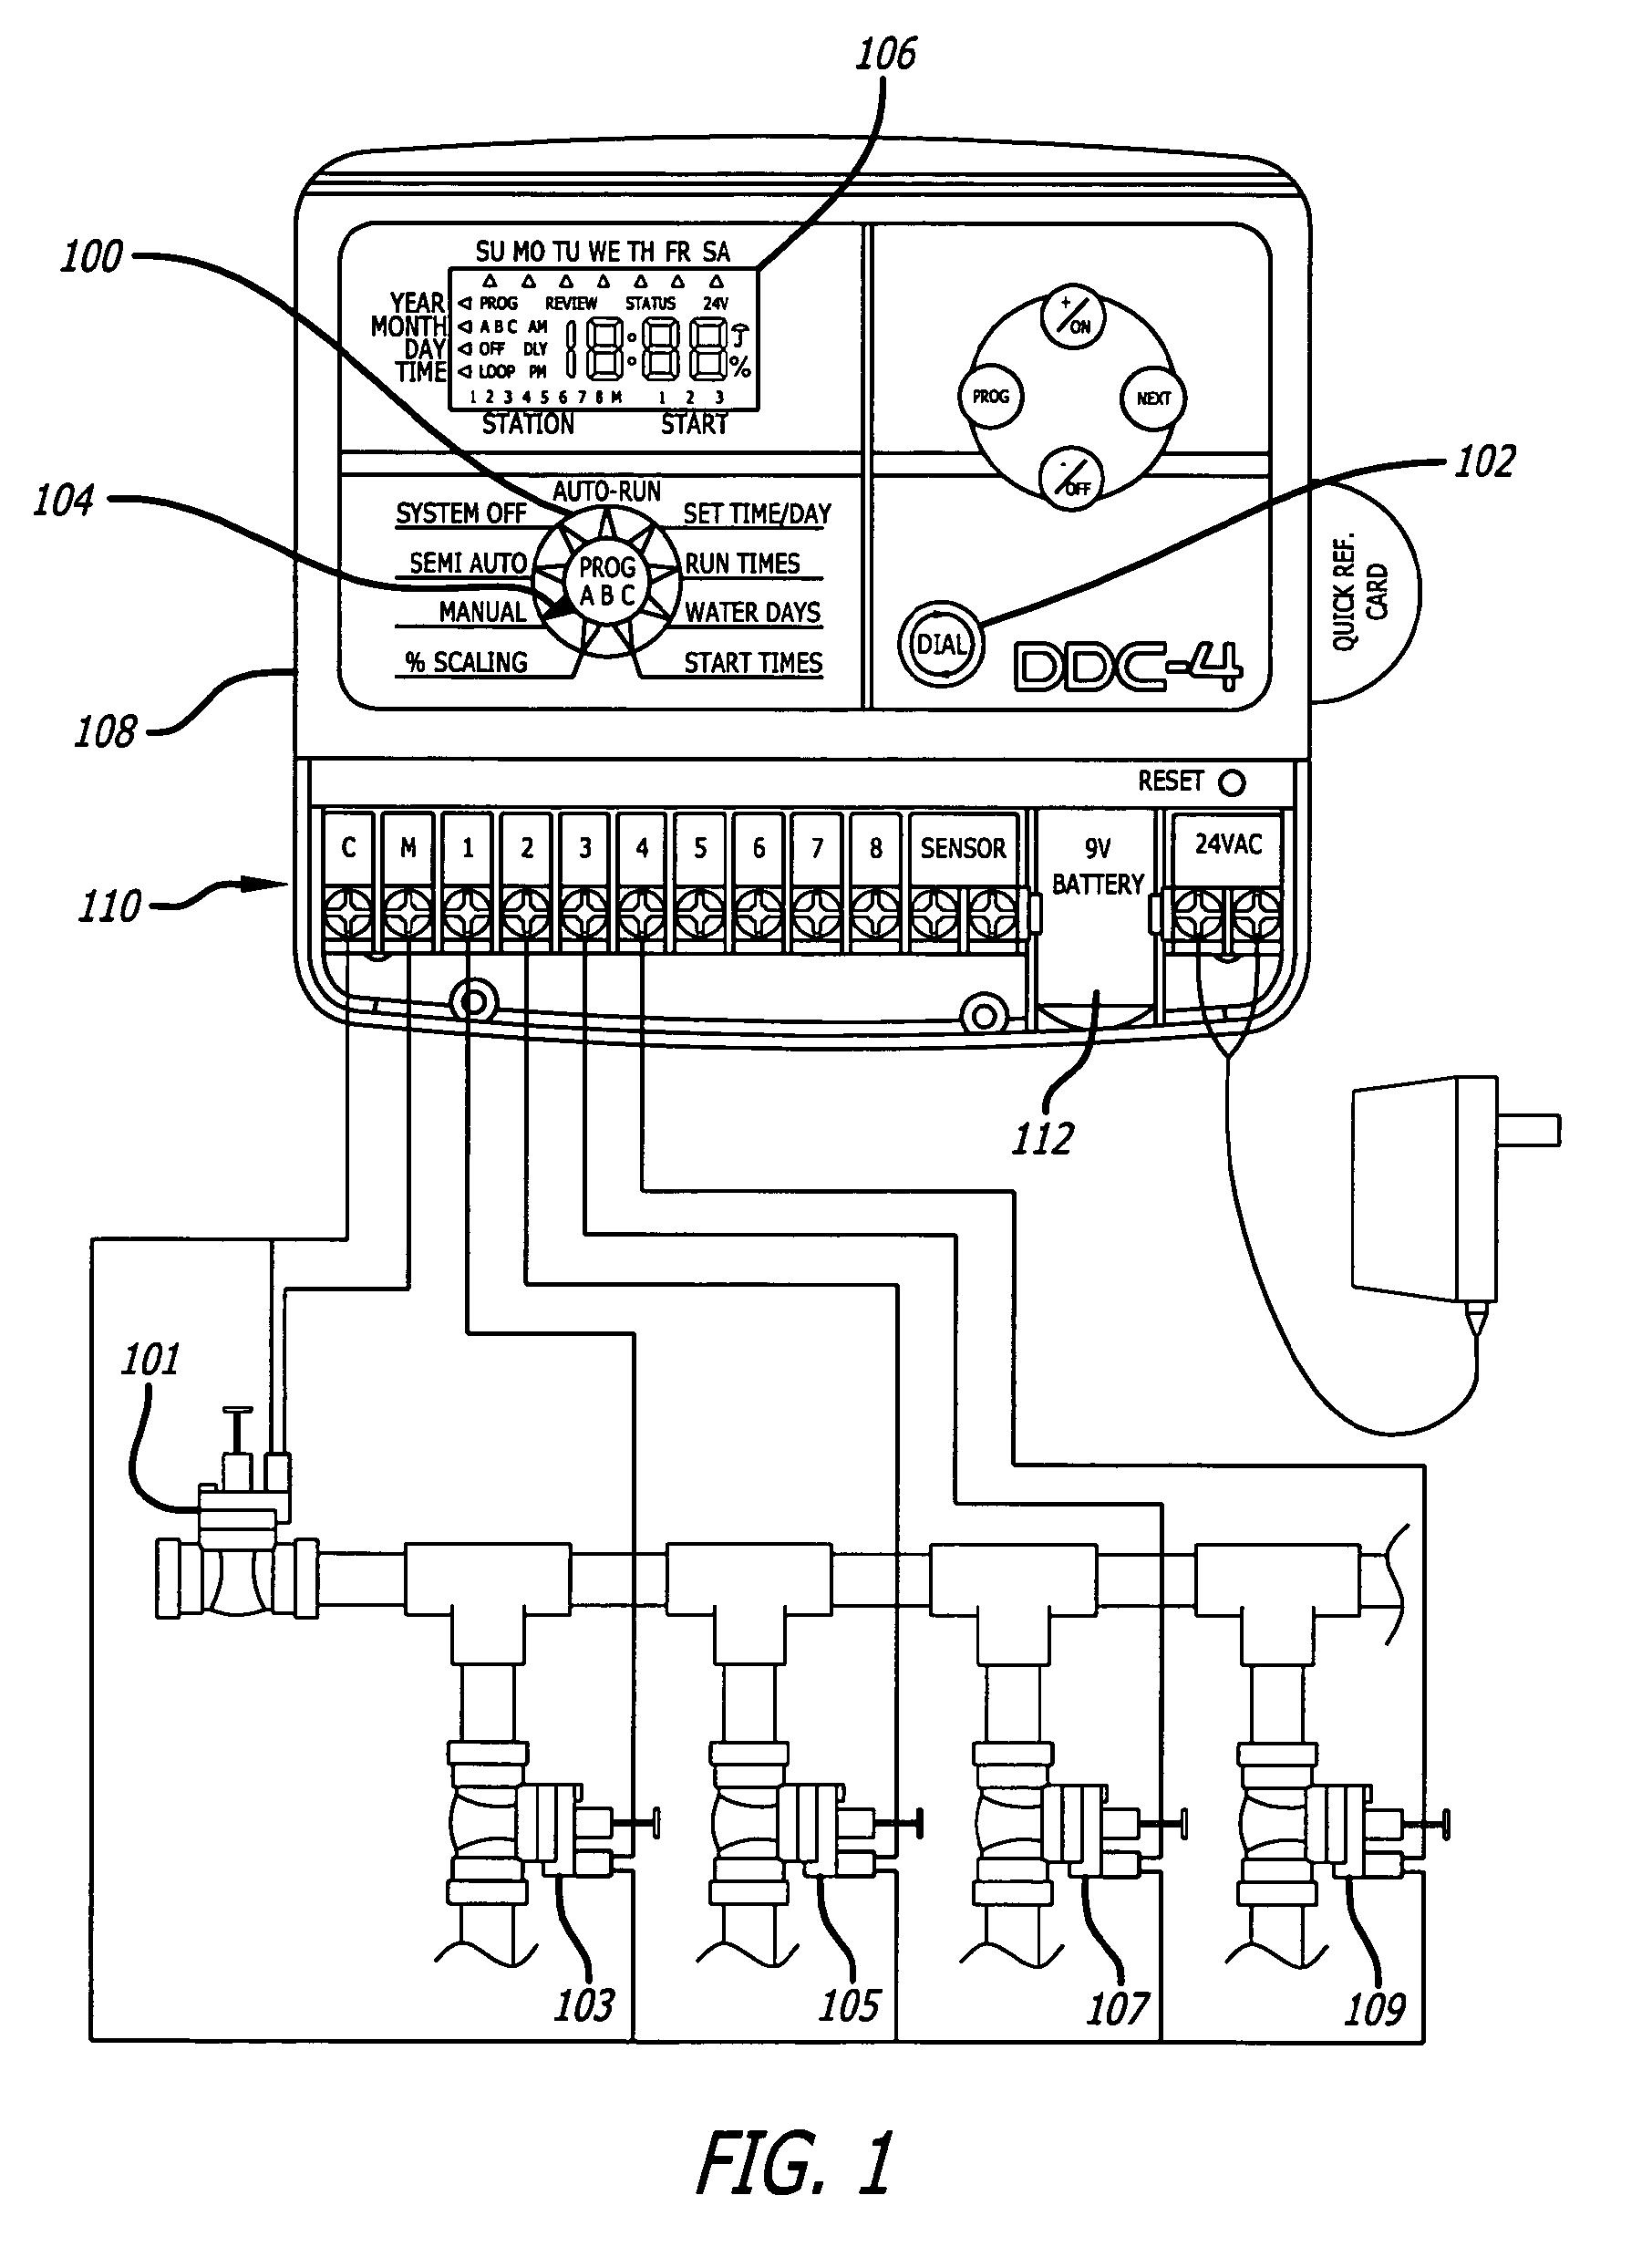 hight resolution of toro sprinkler wiring diagram 29 wiring diagram images orbit sprinkler system wiring diagram sprinkler pump wiring diagram